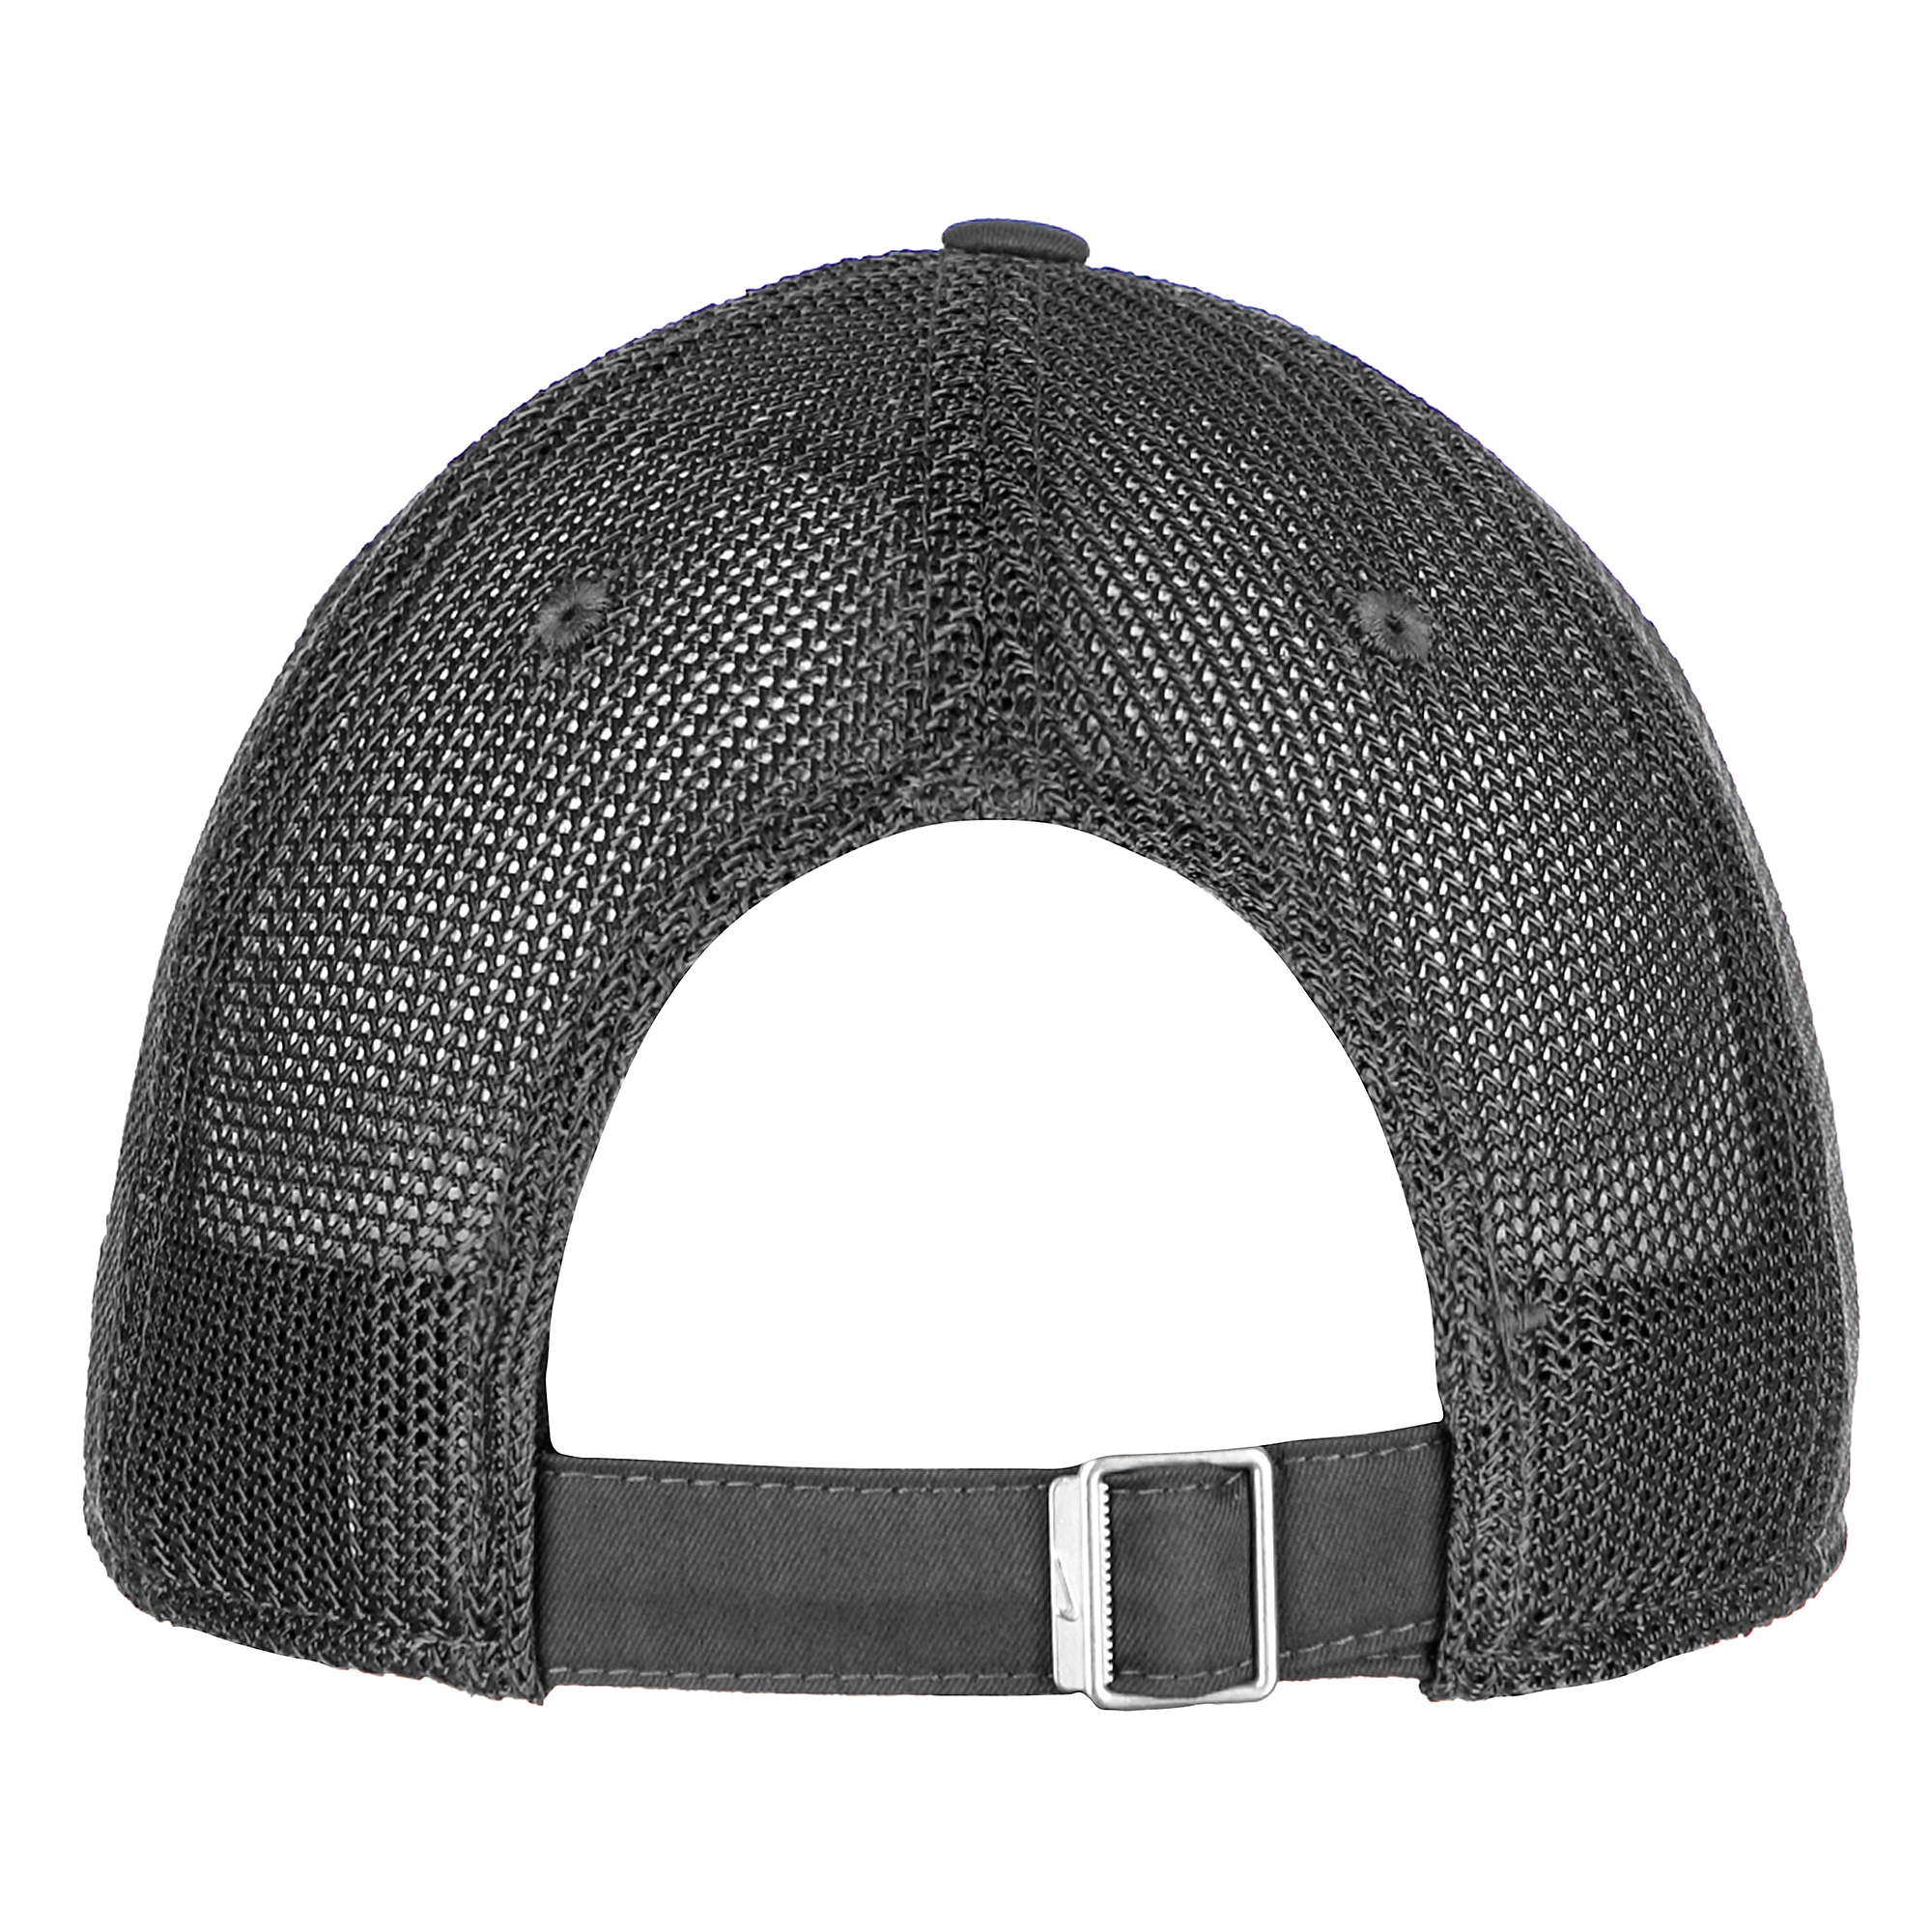 81d49c22a Houston Astros Nike Heritage86 Fabric Adjustable Cap | Fans United